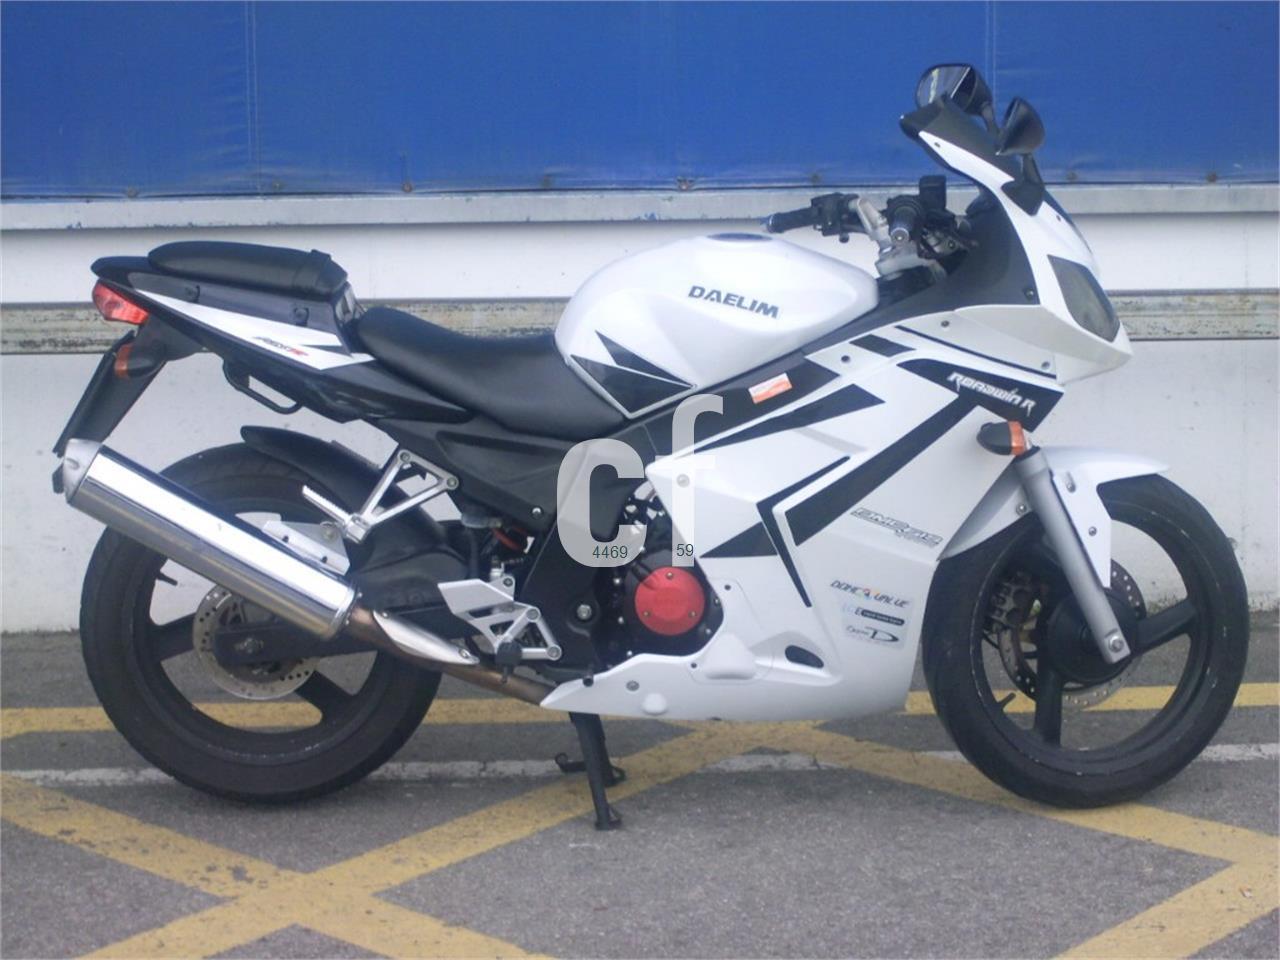 DAELIM Roadwin 125R Fi de venta